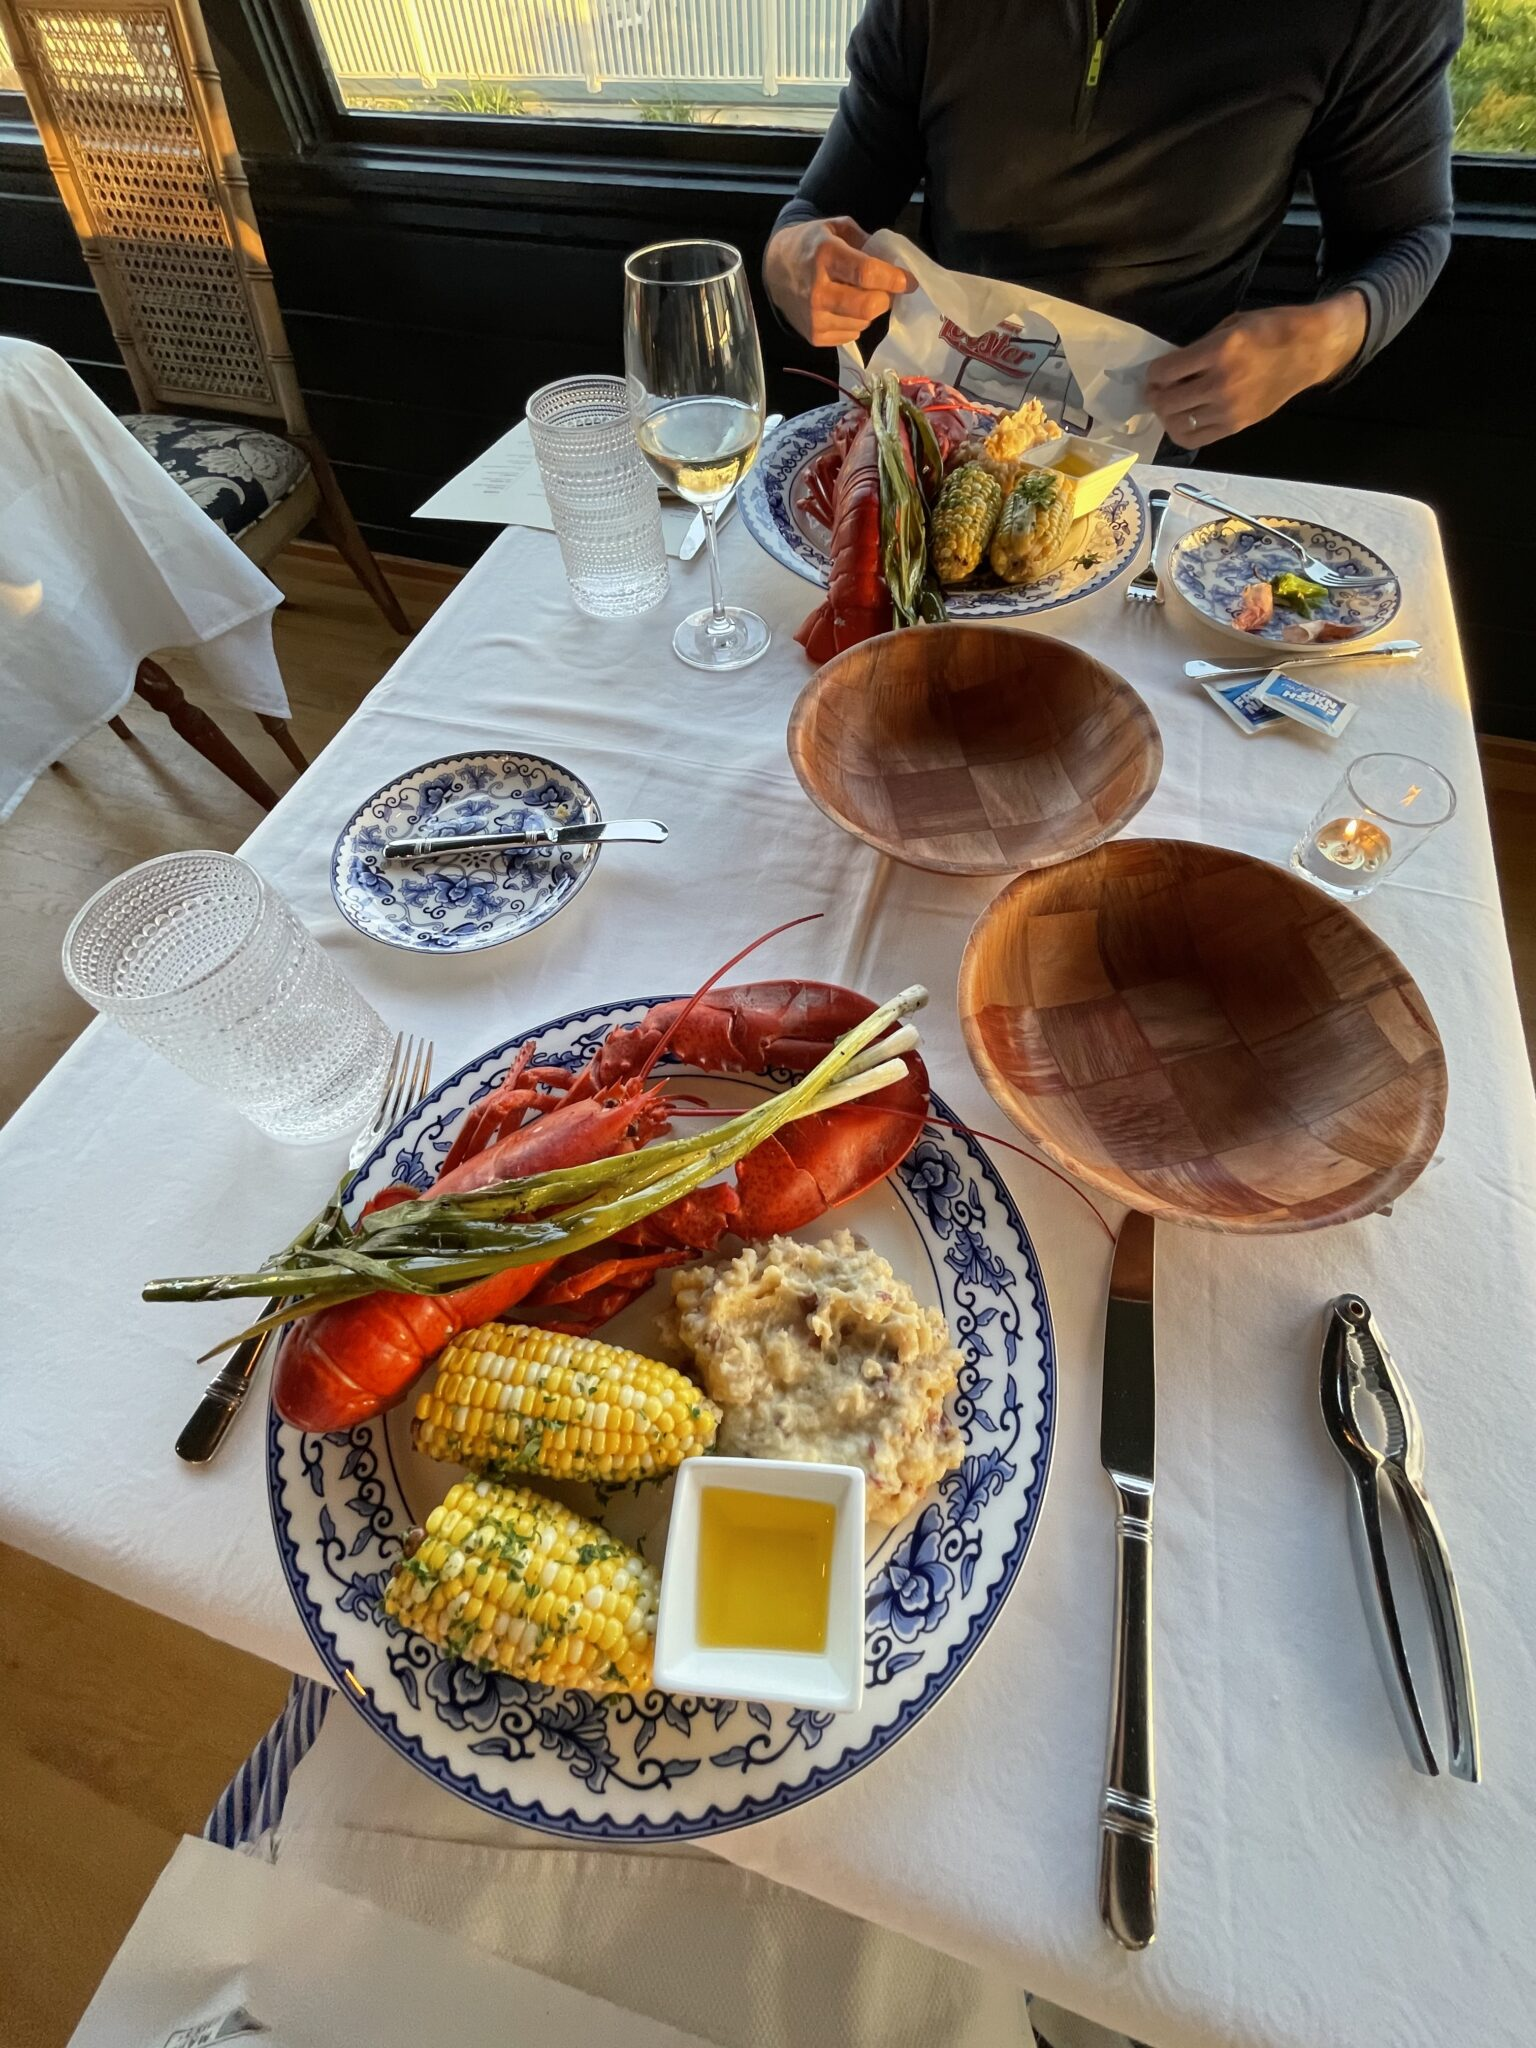 lobster dinner in Maine